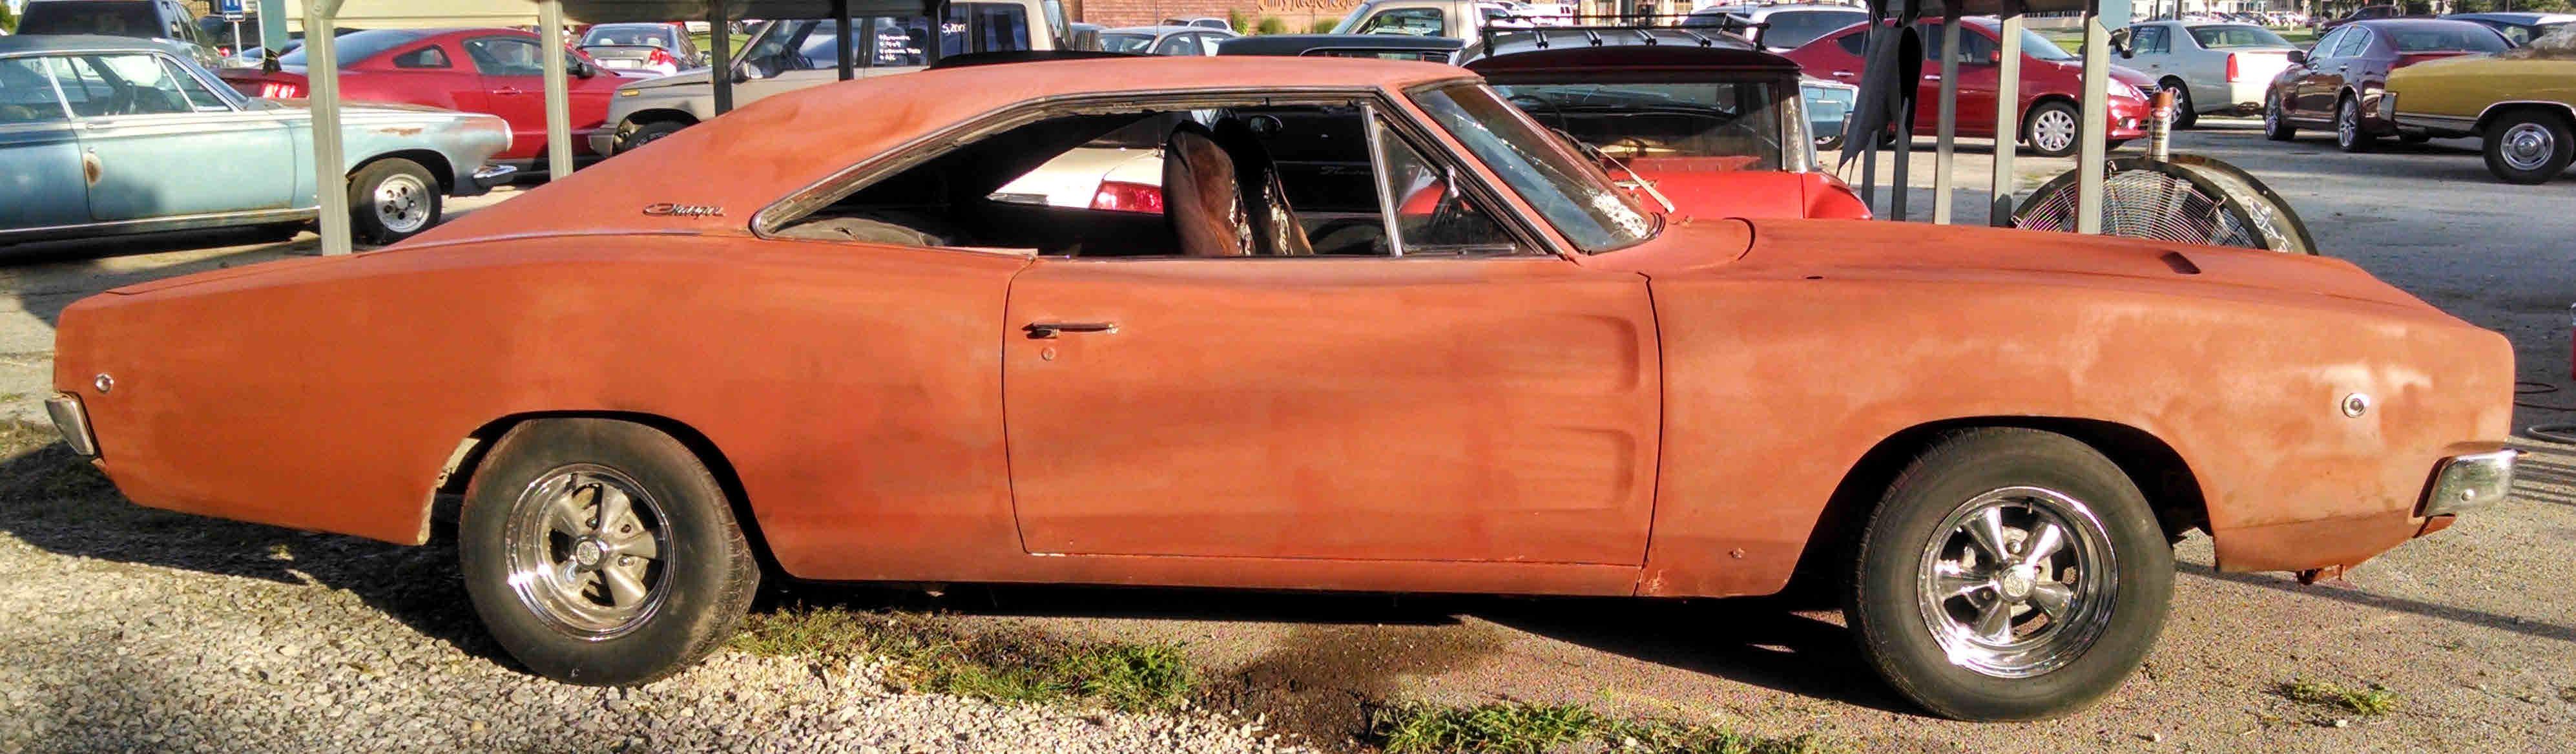 Loughmiller Motors 1968 Chevrolet Caprice 2 Door Dodge Charger Sold Primered Originally Red W Tan Vinyl Top 440 V 8 Now Was 383 Auto 11000